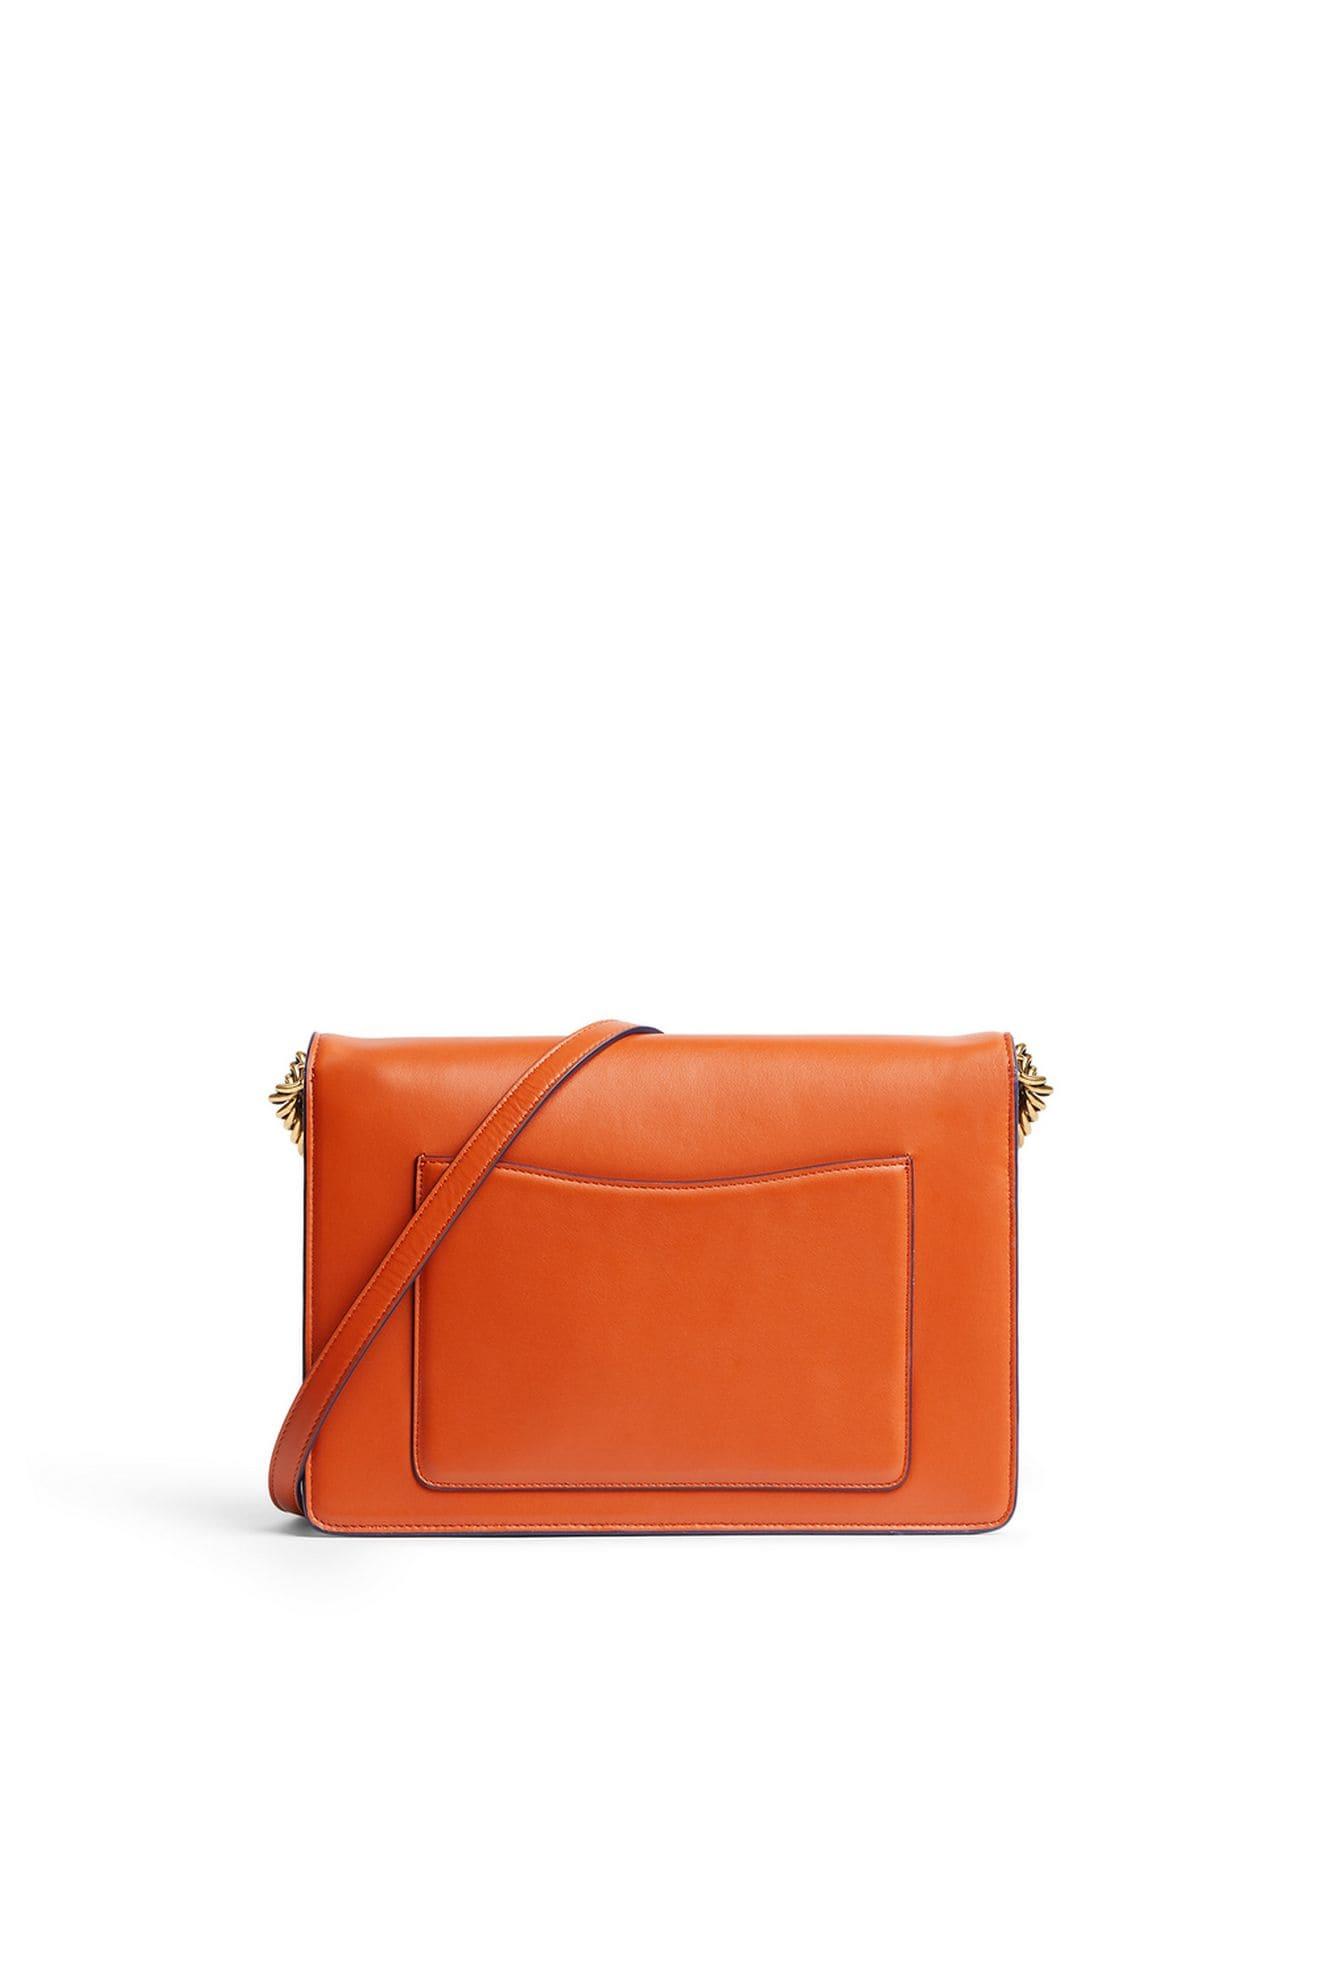 roberto-cavalli-medium-shoulder-bag-with-lucky-symbols_13151035_15413868_1320